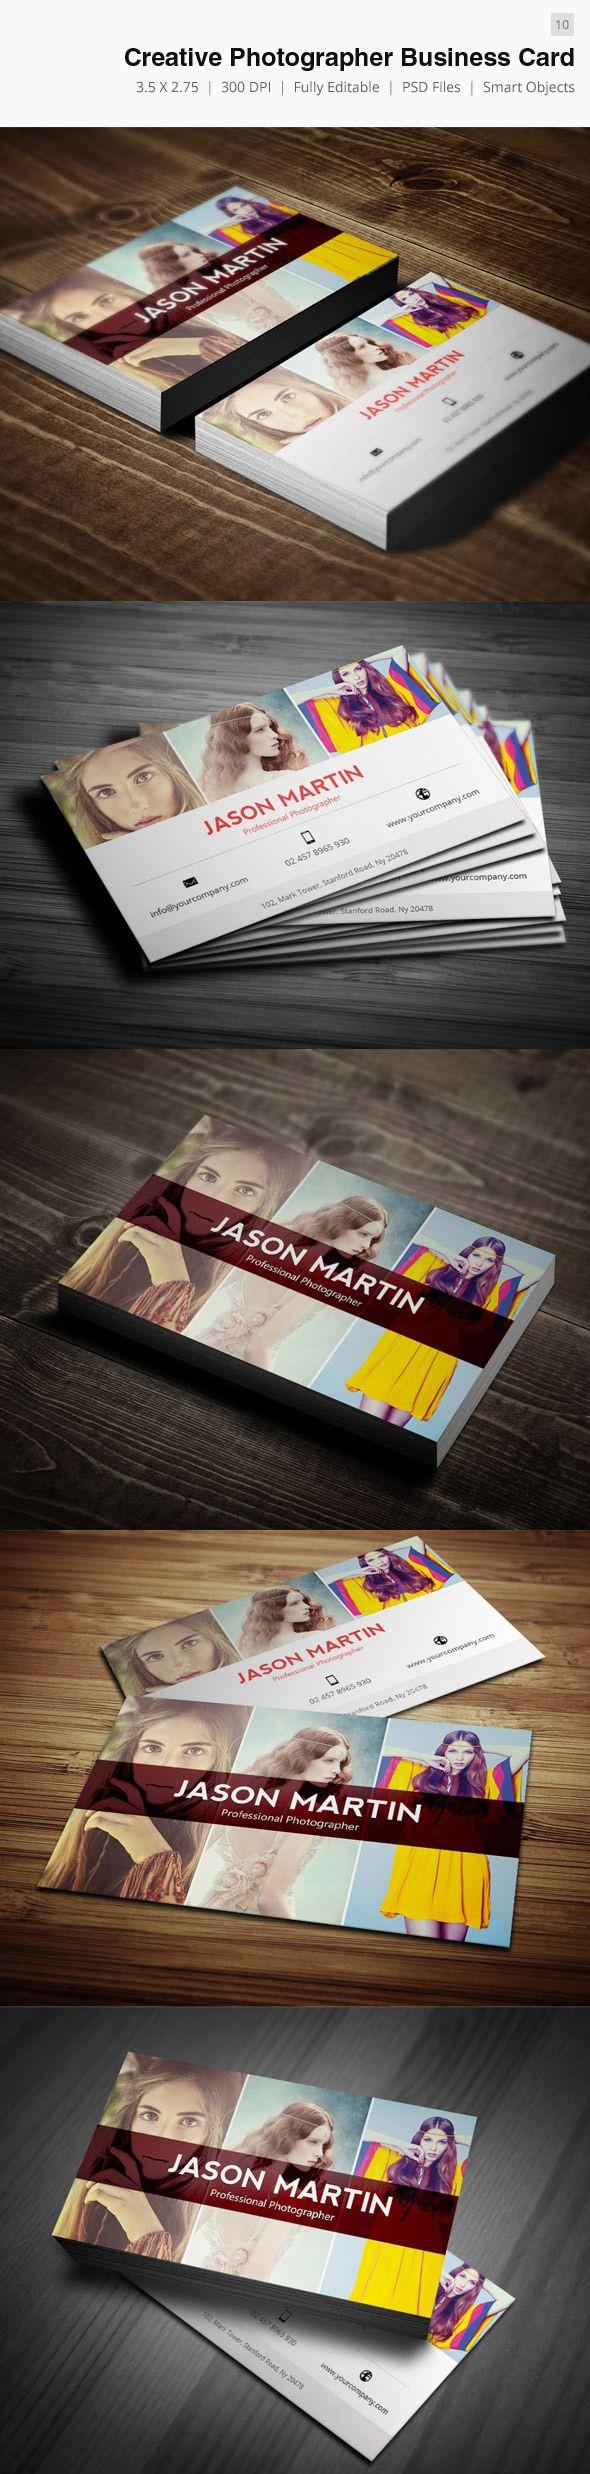 Creative Photographer Business Card by Bouncy Studio, via Behance